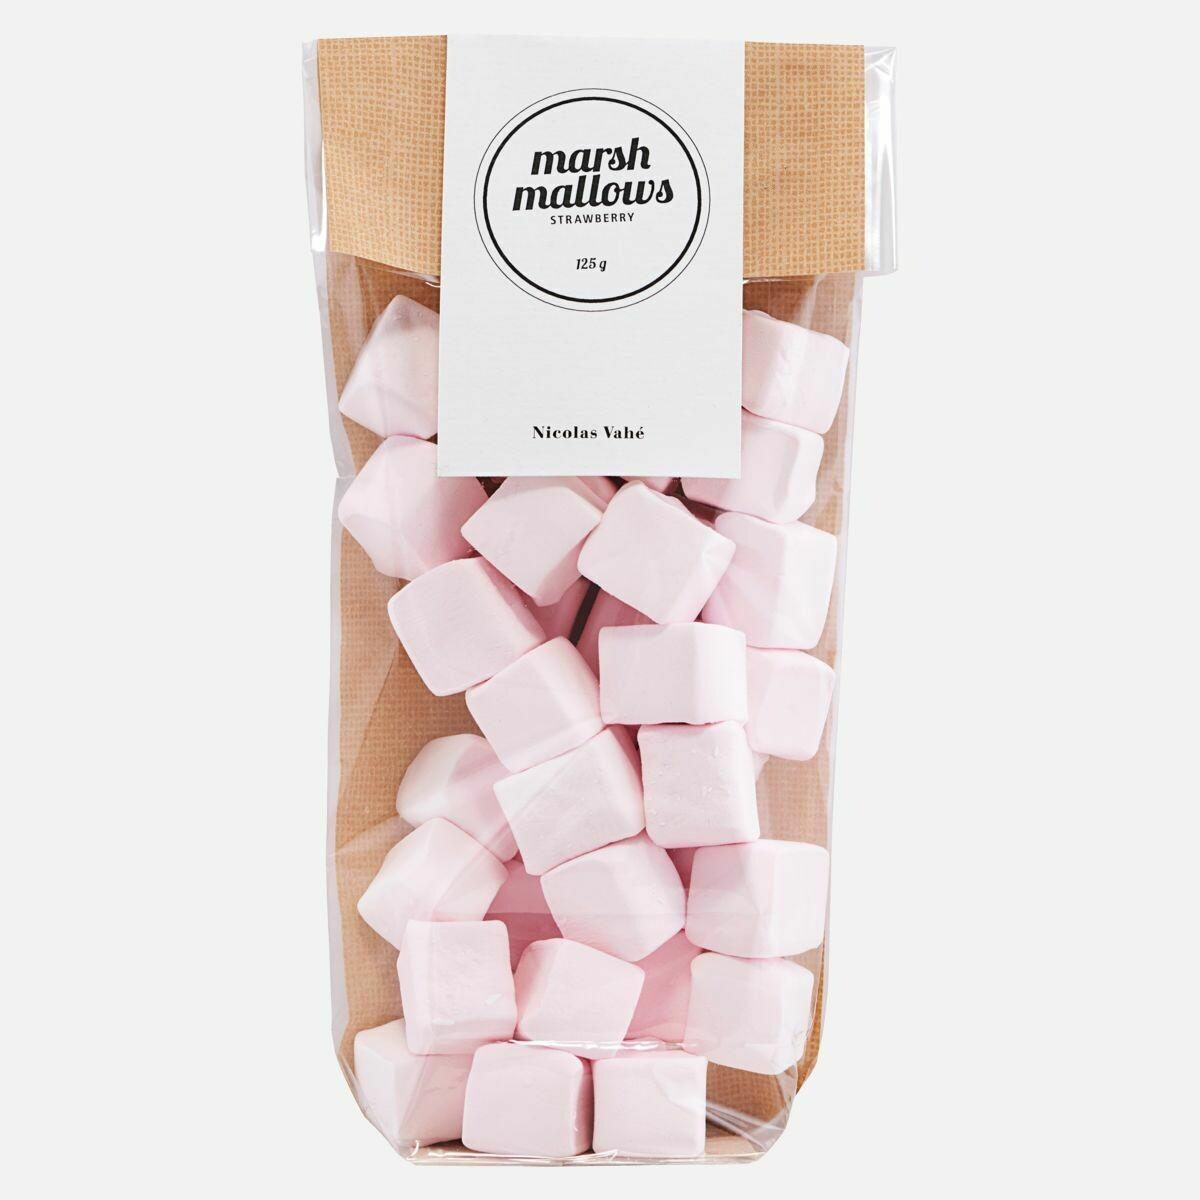 Marshmallows - Strawberry